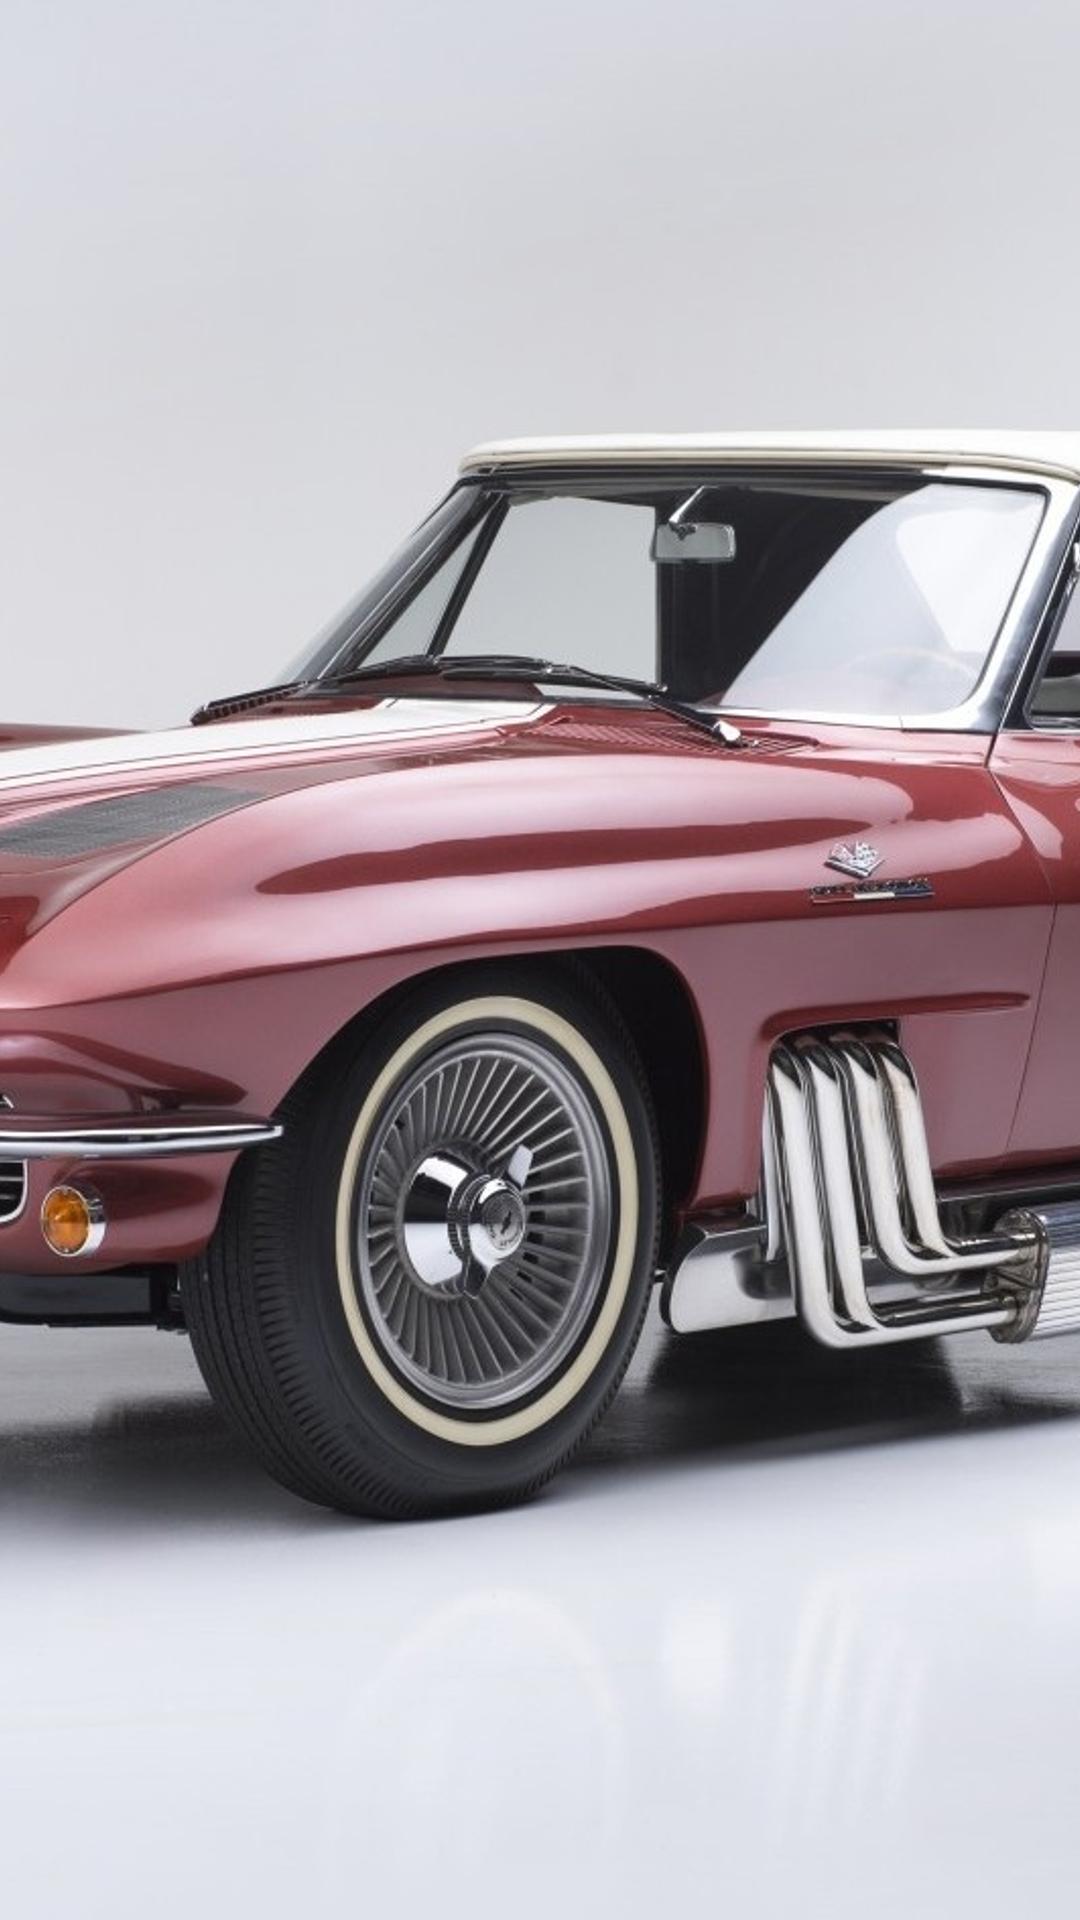 Burgundy Chevrolet Corvette Stingray Wallpaper Download 1080x1920